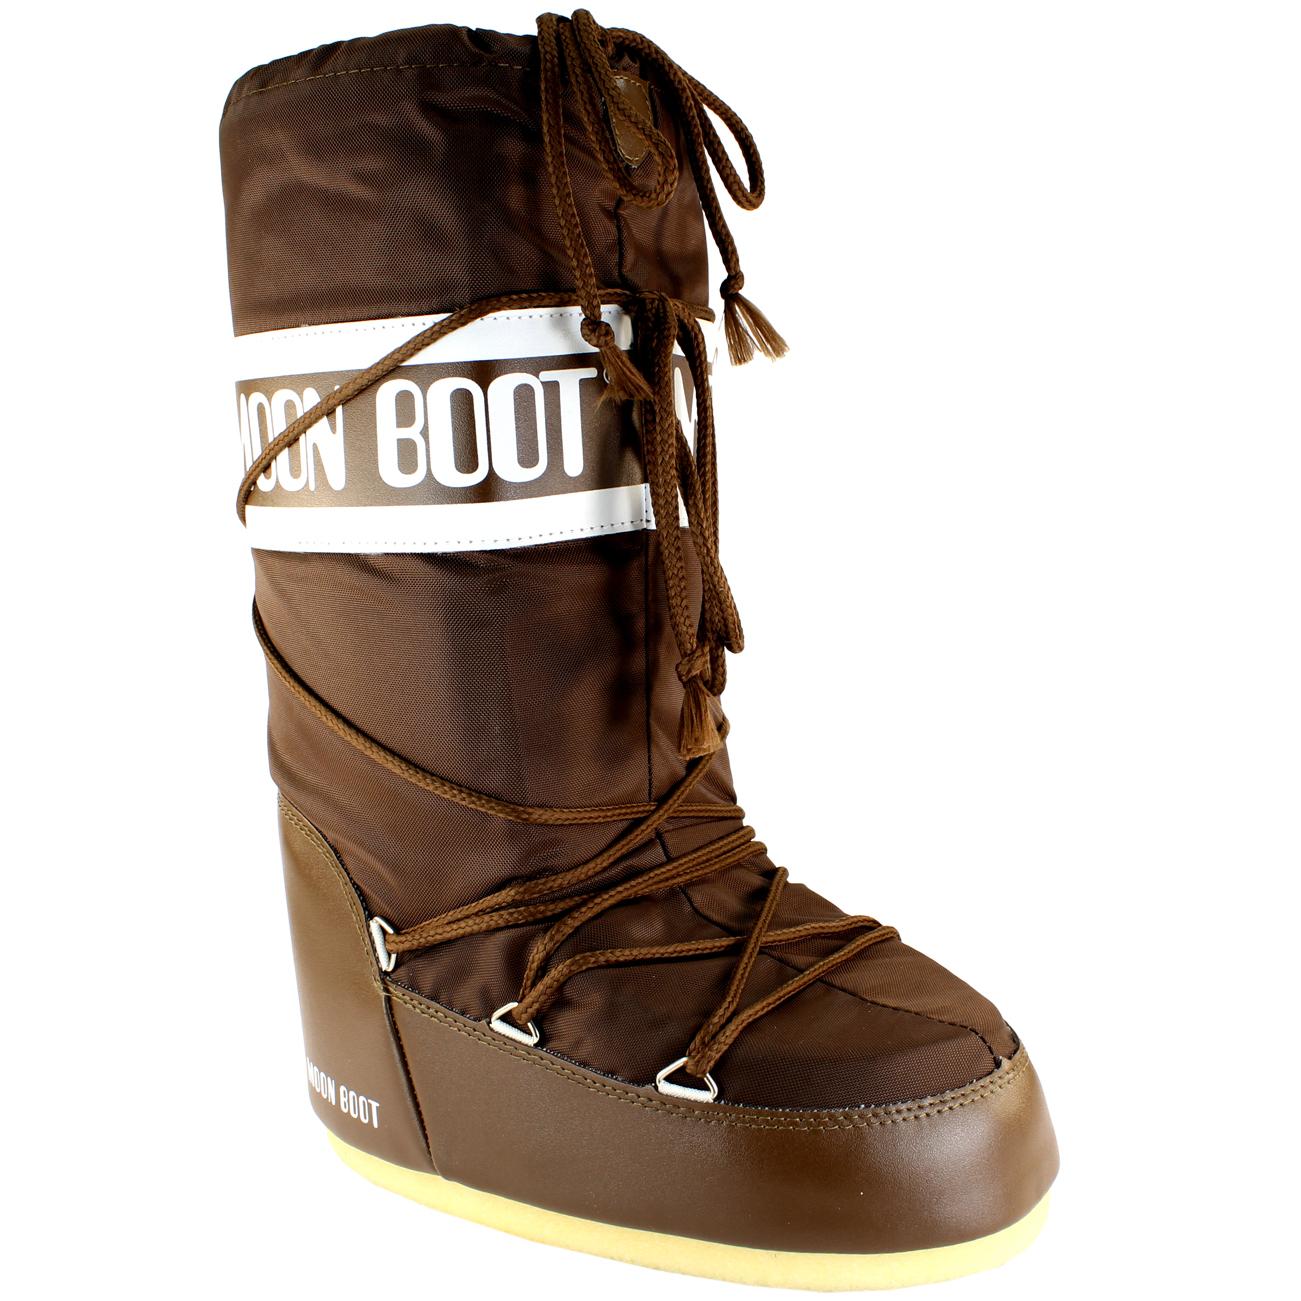 Mujer-Tecnica-Moon-Boot-Nylon-A-Prueba-De-Agua-Lluvia-Invierno-Botas-Nieve-esqui-bicis-3-8